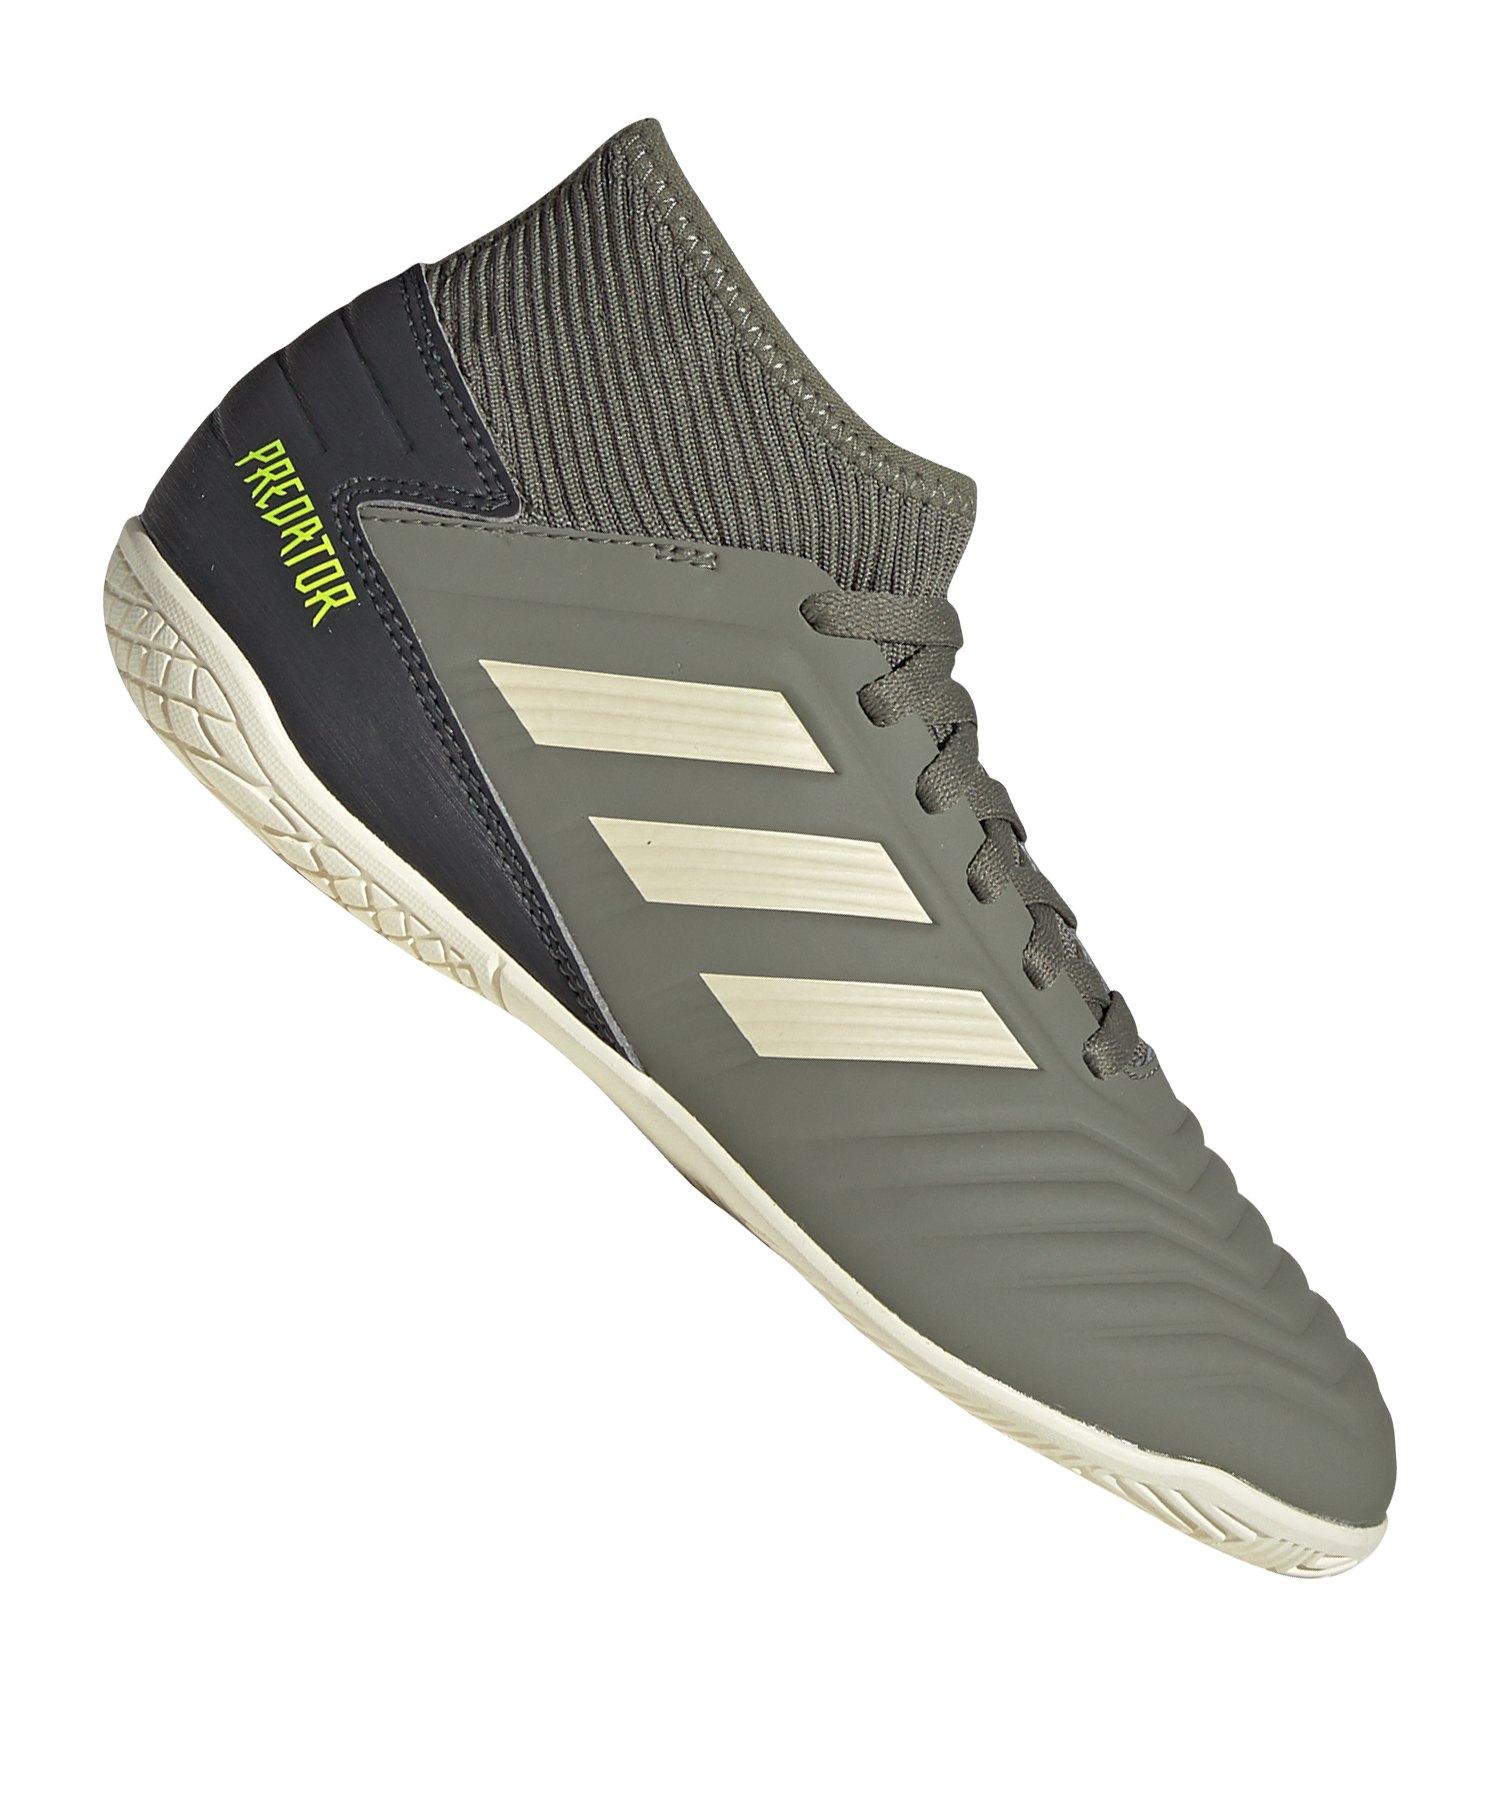 Nike Mercurial Fußballschuhe Halle Indoor 33 grün 20,5 cm